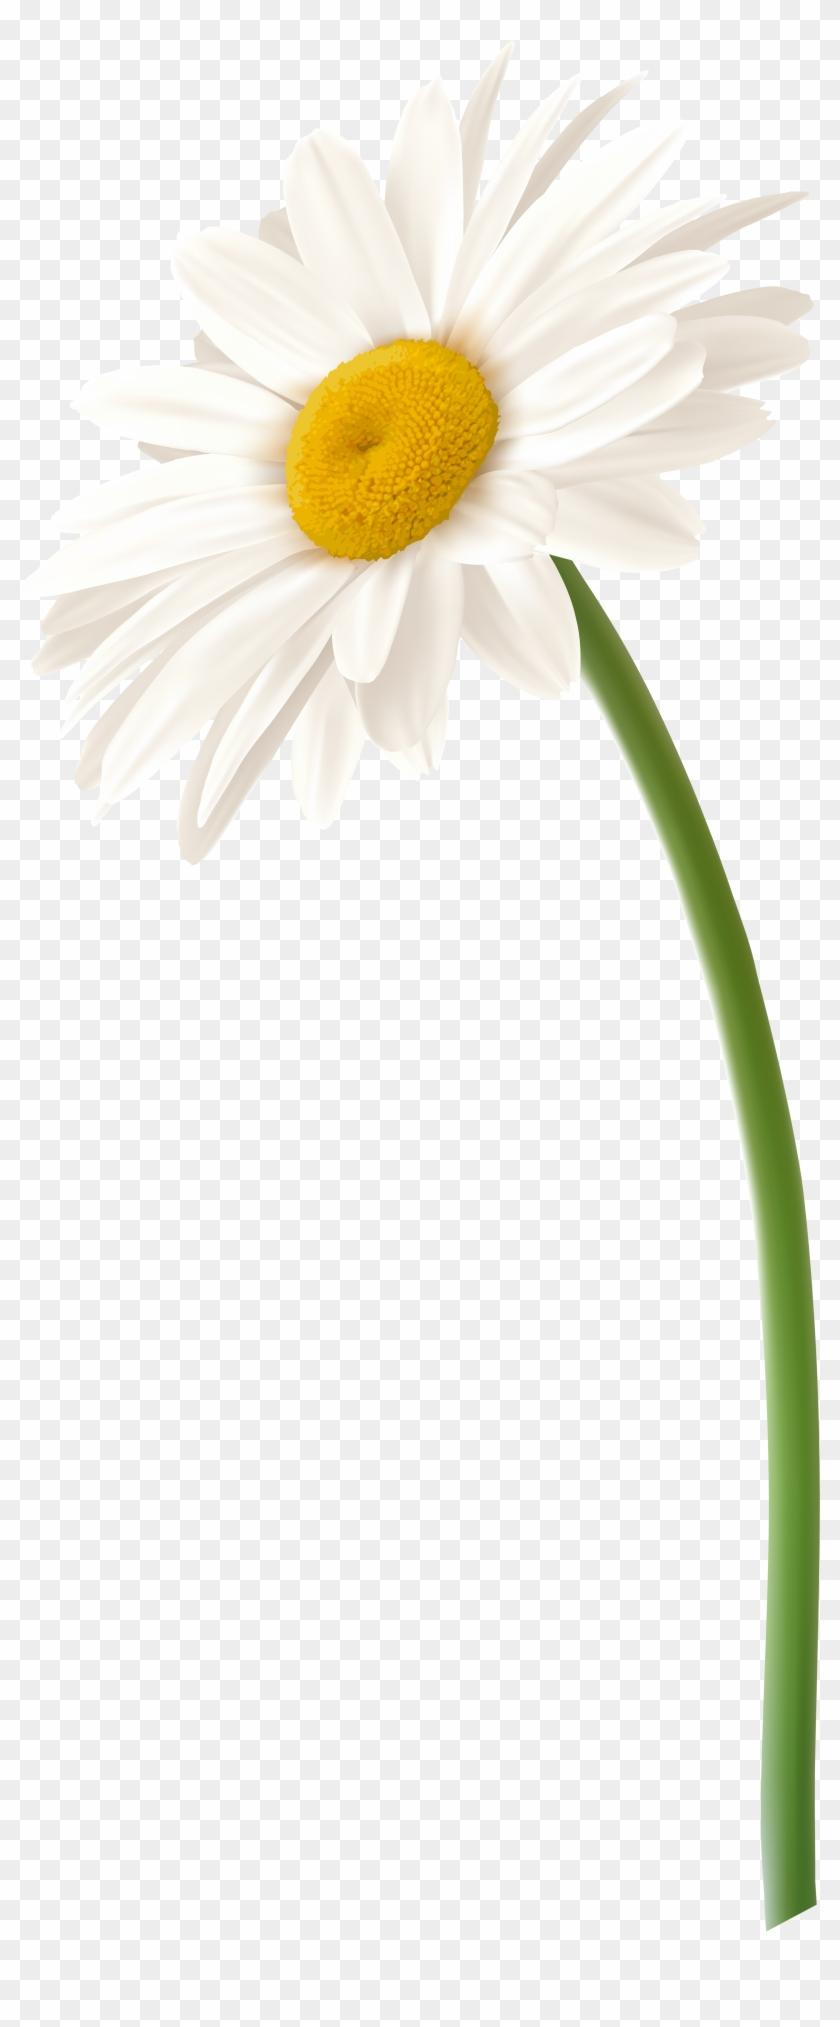 Daisy clipart sad. Gerbera at getdrawings white